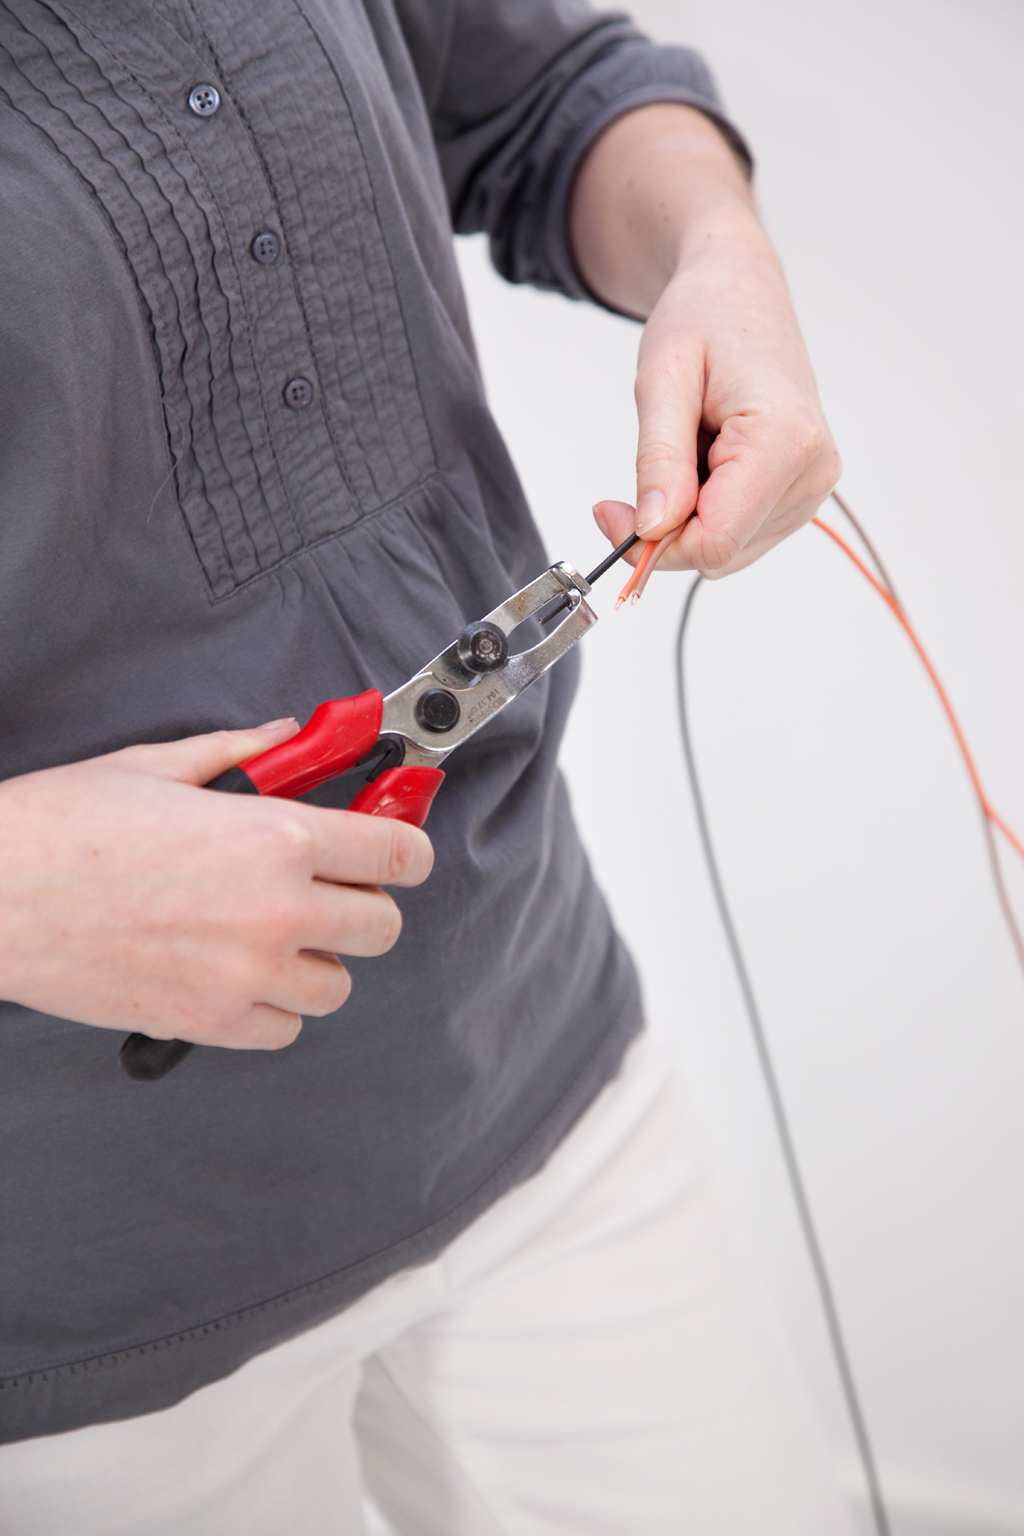 Installer des interrupteurs en va-et-vient